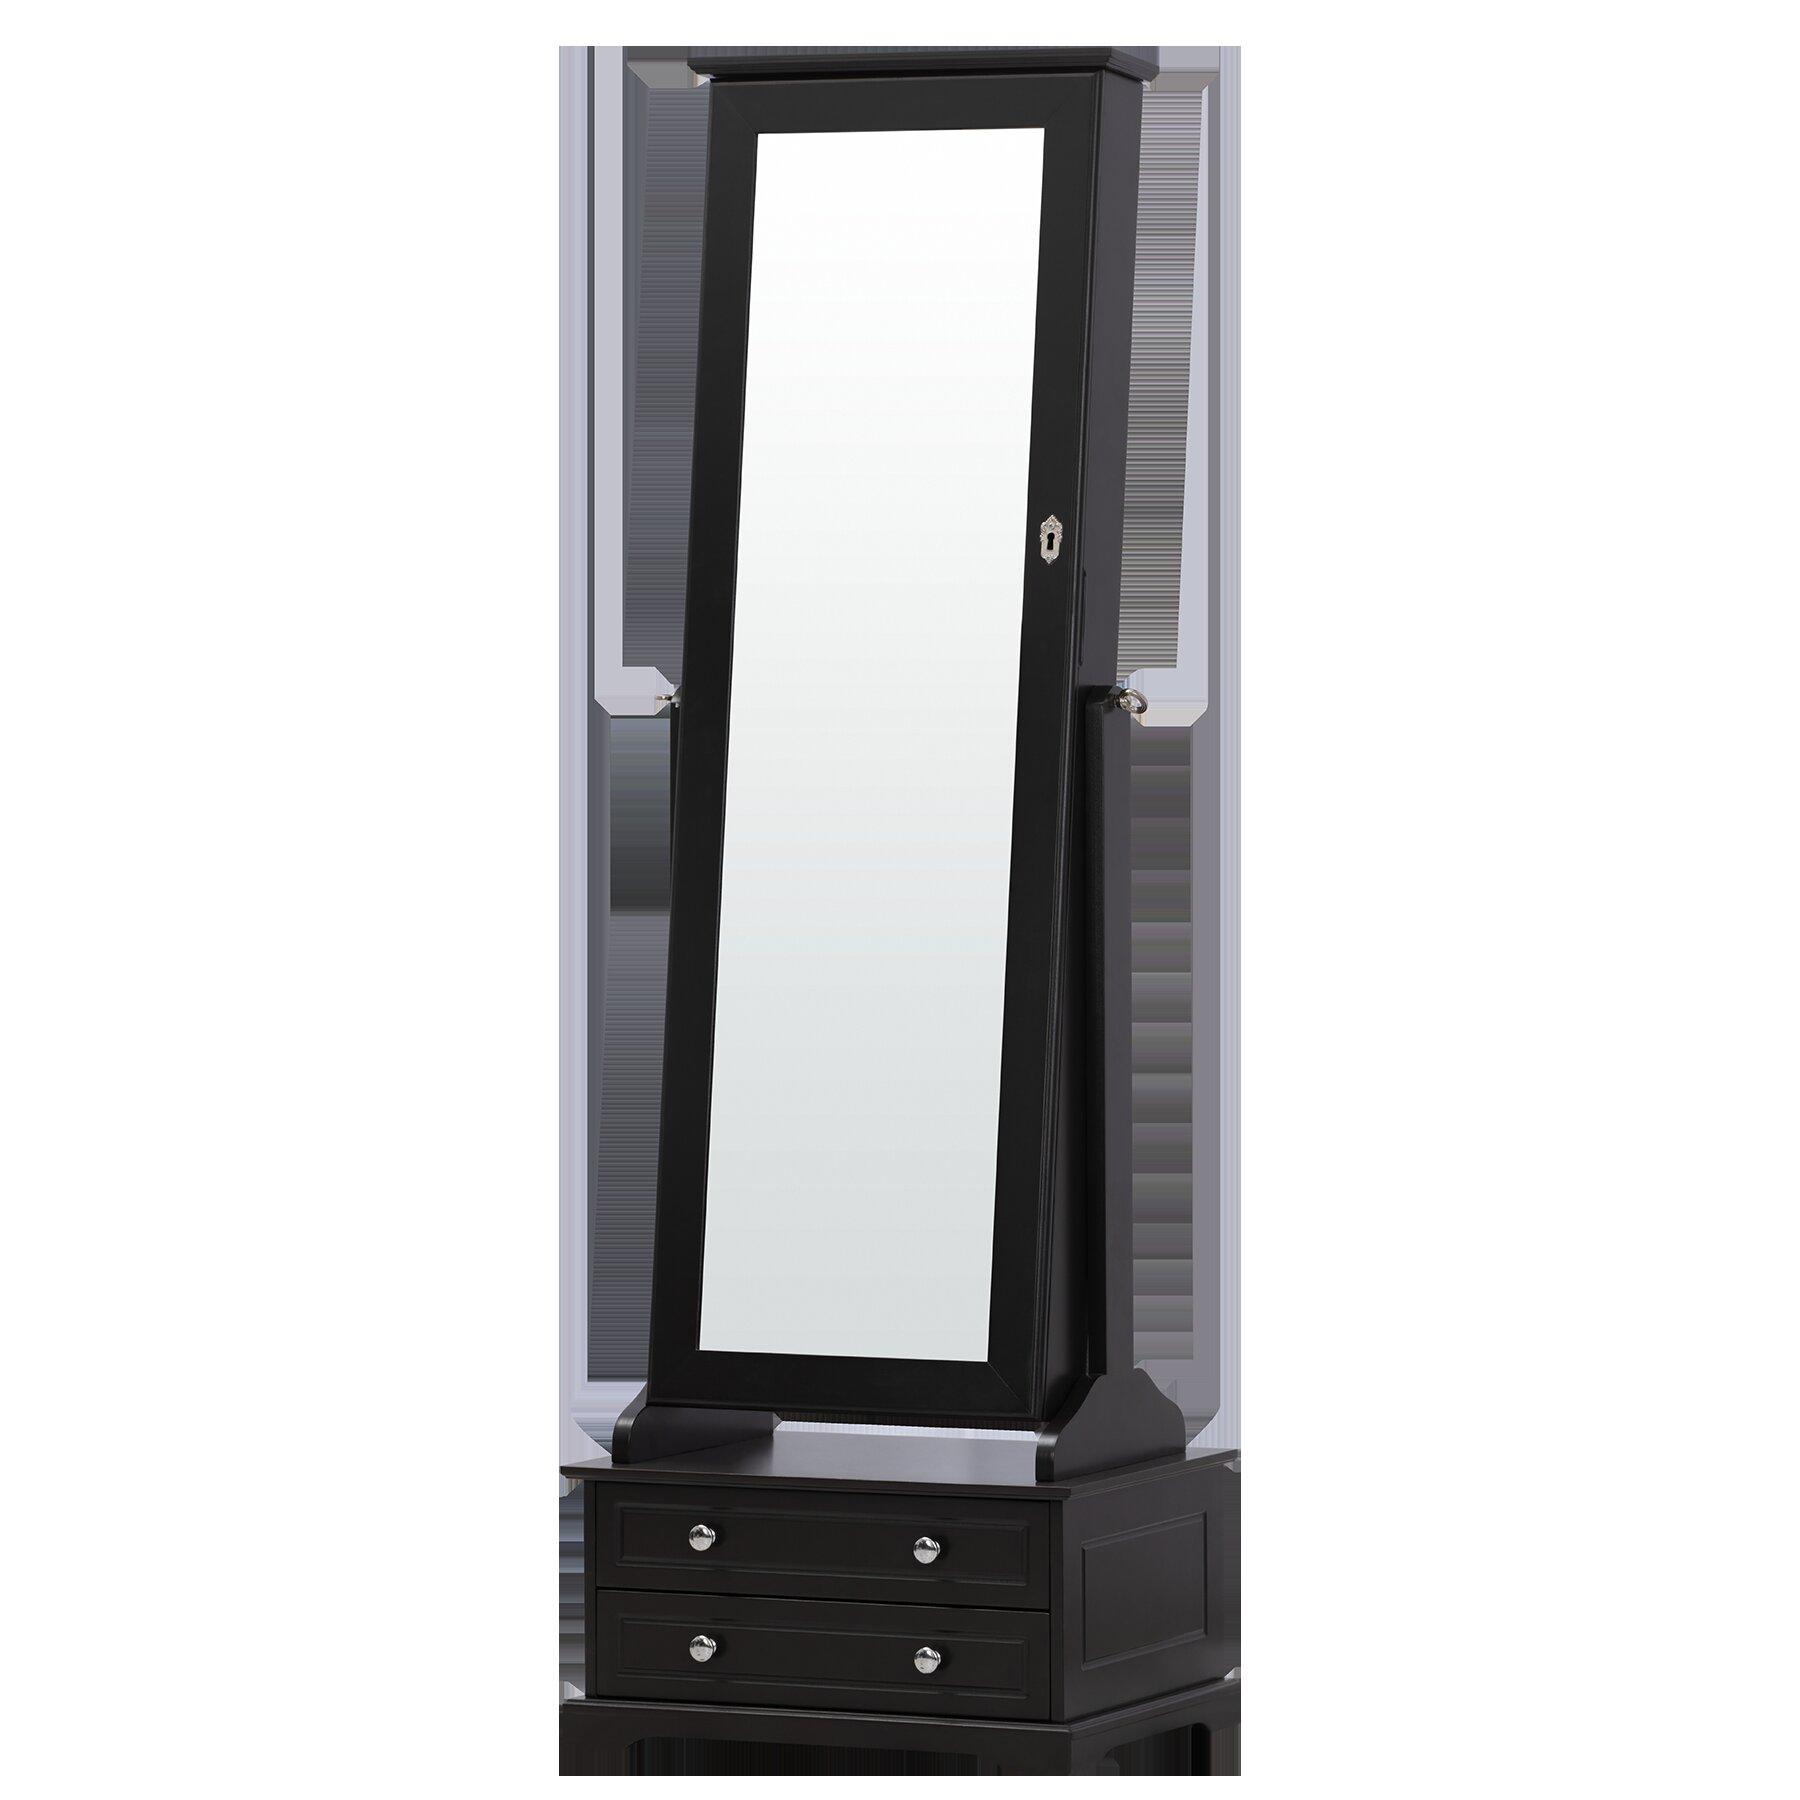 Merveilleux Canora Grey Odacia Free Standing Jewelry Armoire With Mirror | Wayfair